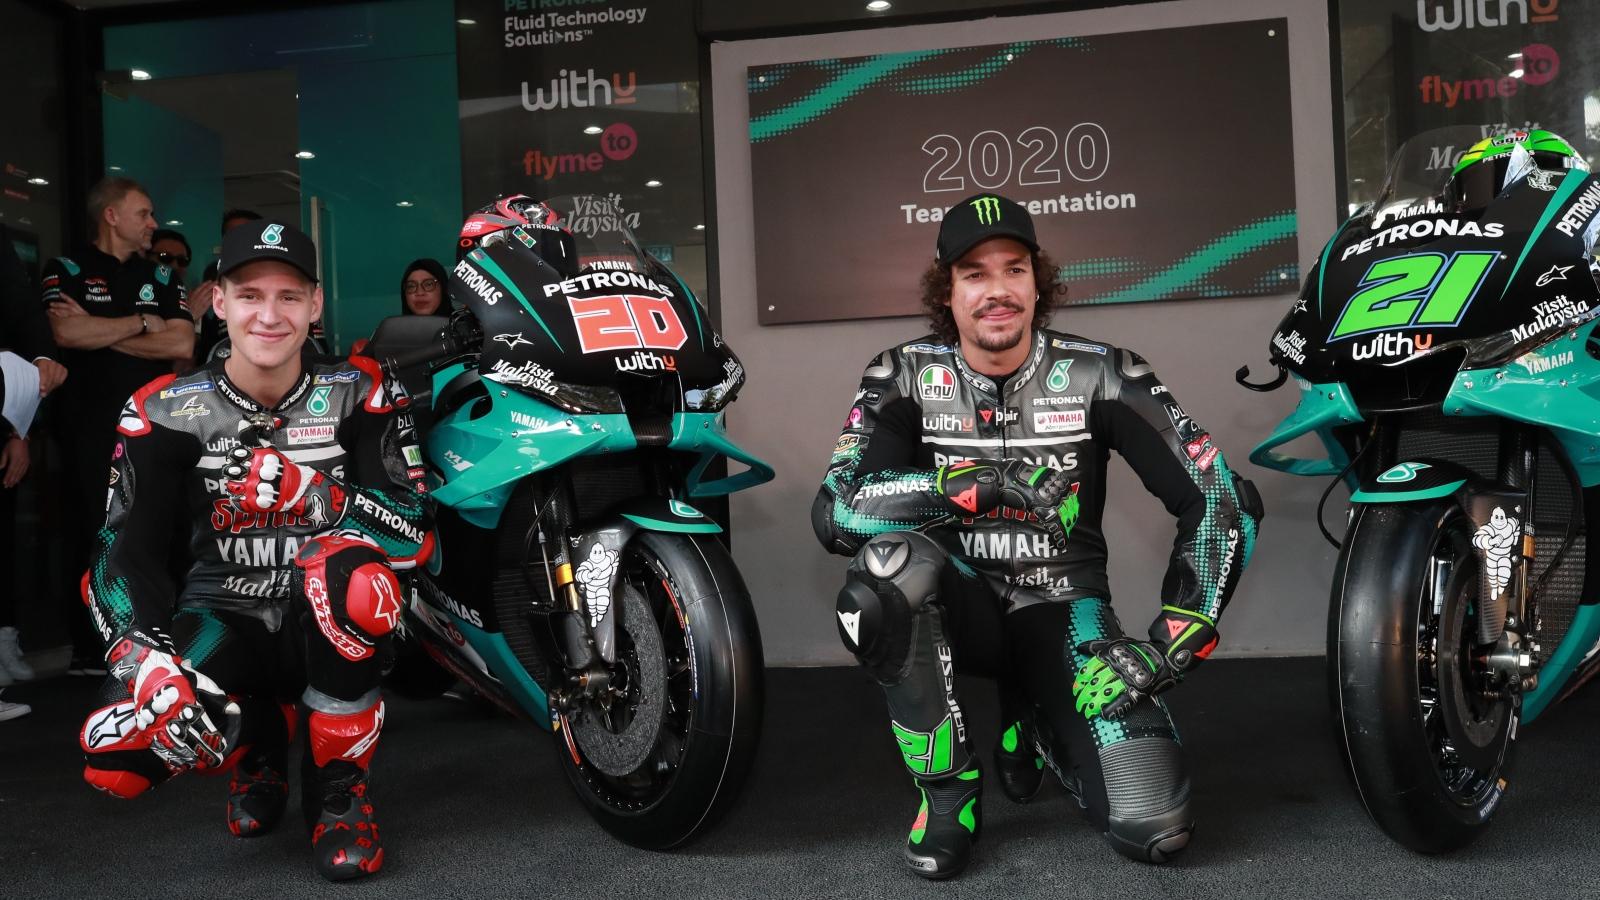 La Yamaha YZR-M1 Petronas para MotoGP 2020 de Fabio Quartararo y Franco Morbidelli